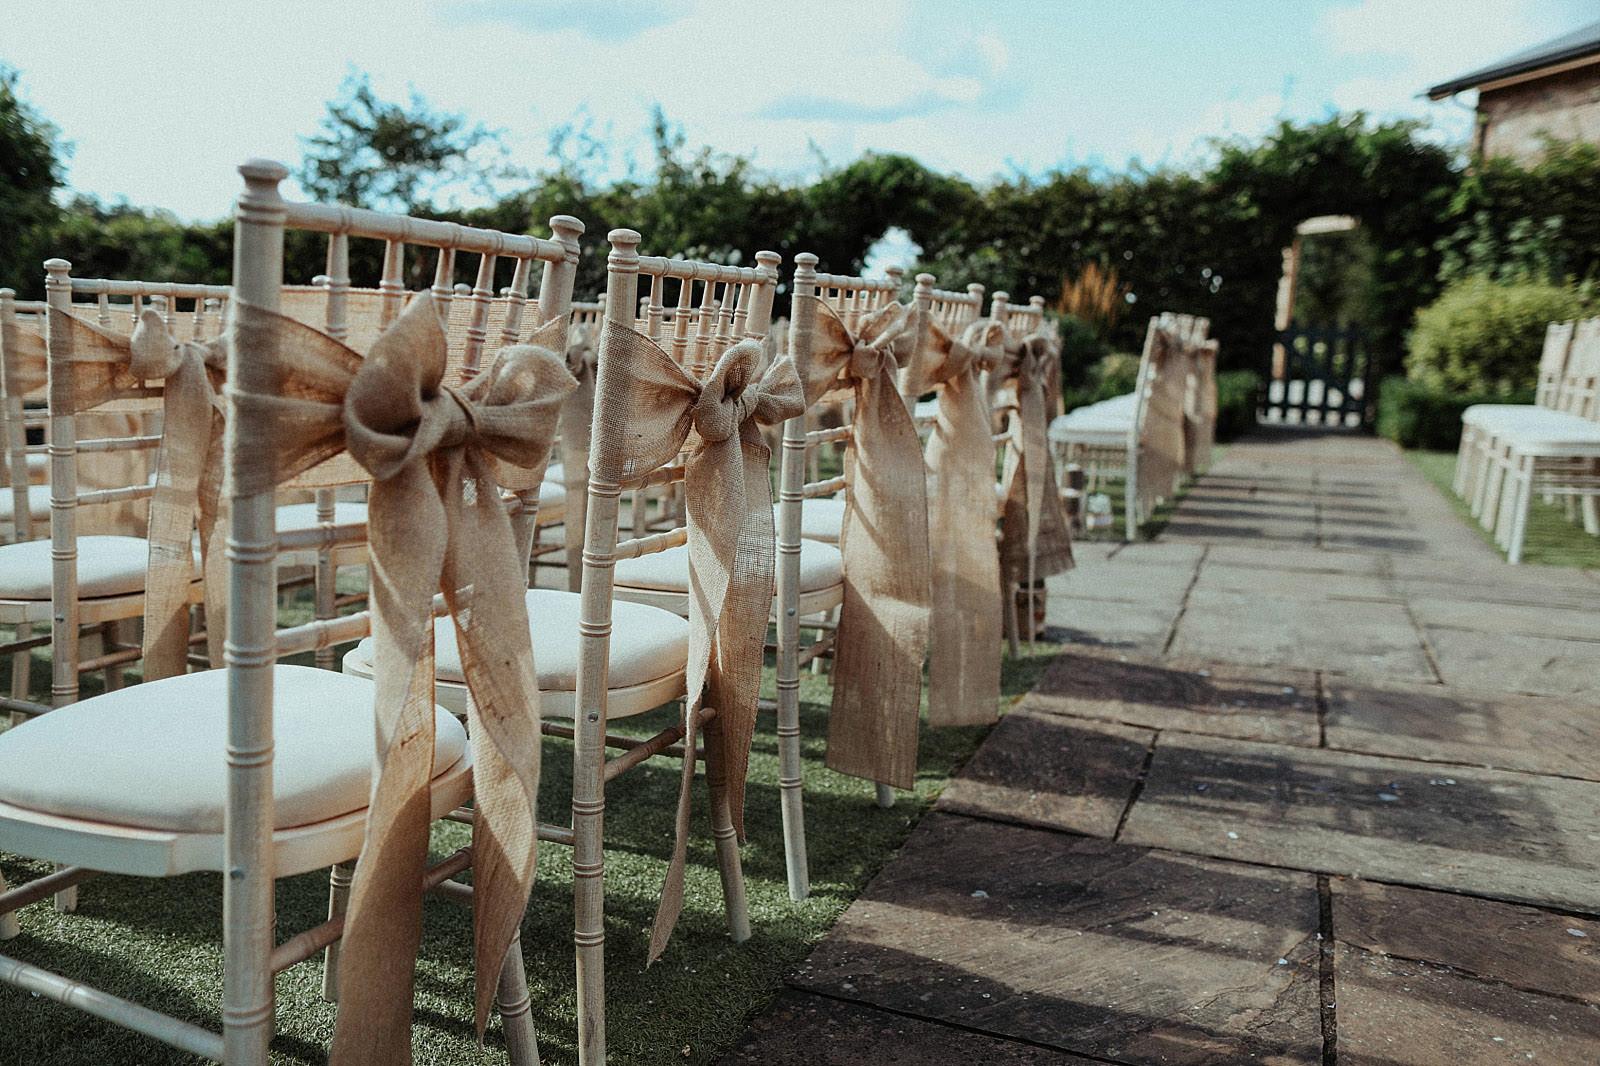 Pryors-Hayes-Wedding-Photography-Barn-Venue-Cheshire-embee-photography-0049.jpg